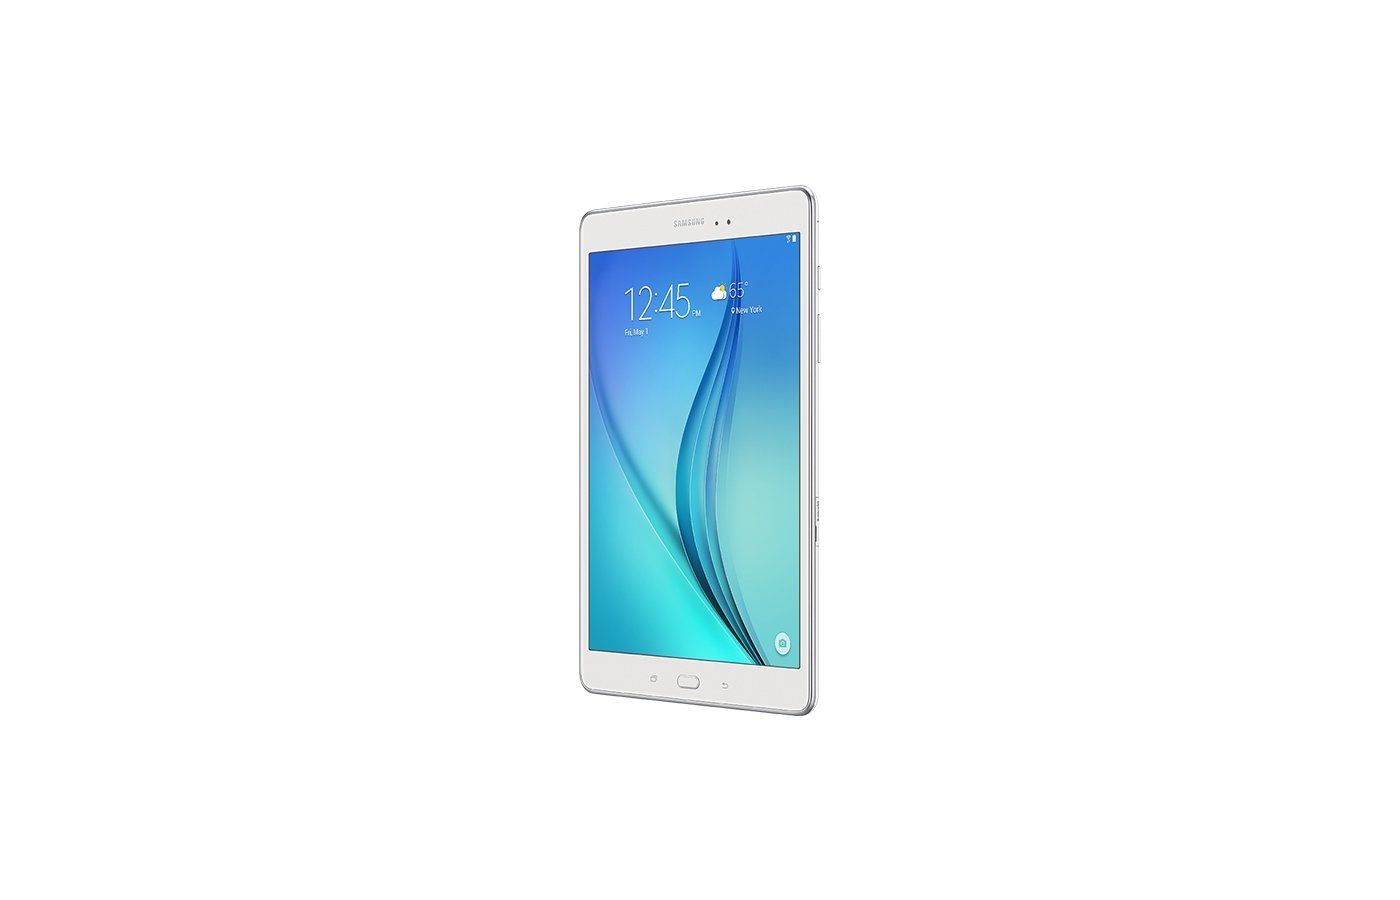 Планшет Samsung GALAXY Tab A 9.7 /SM-T550NZWASER/ WiFi 16Gb White